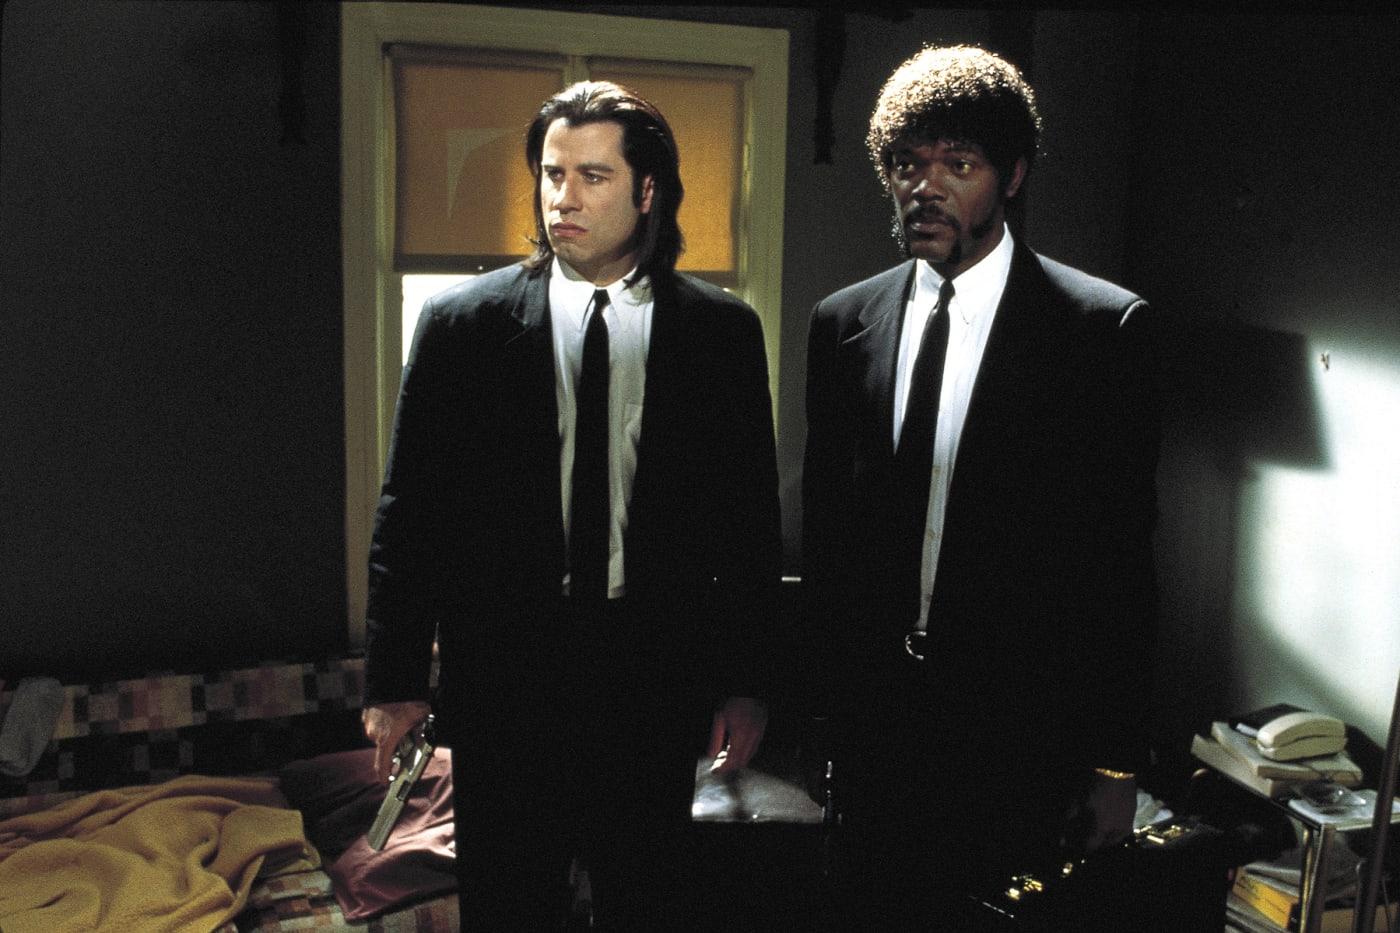 Quentin Tarantino's Pulp Fiction